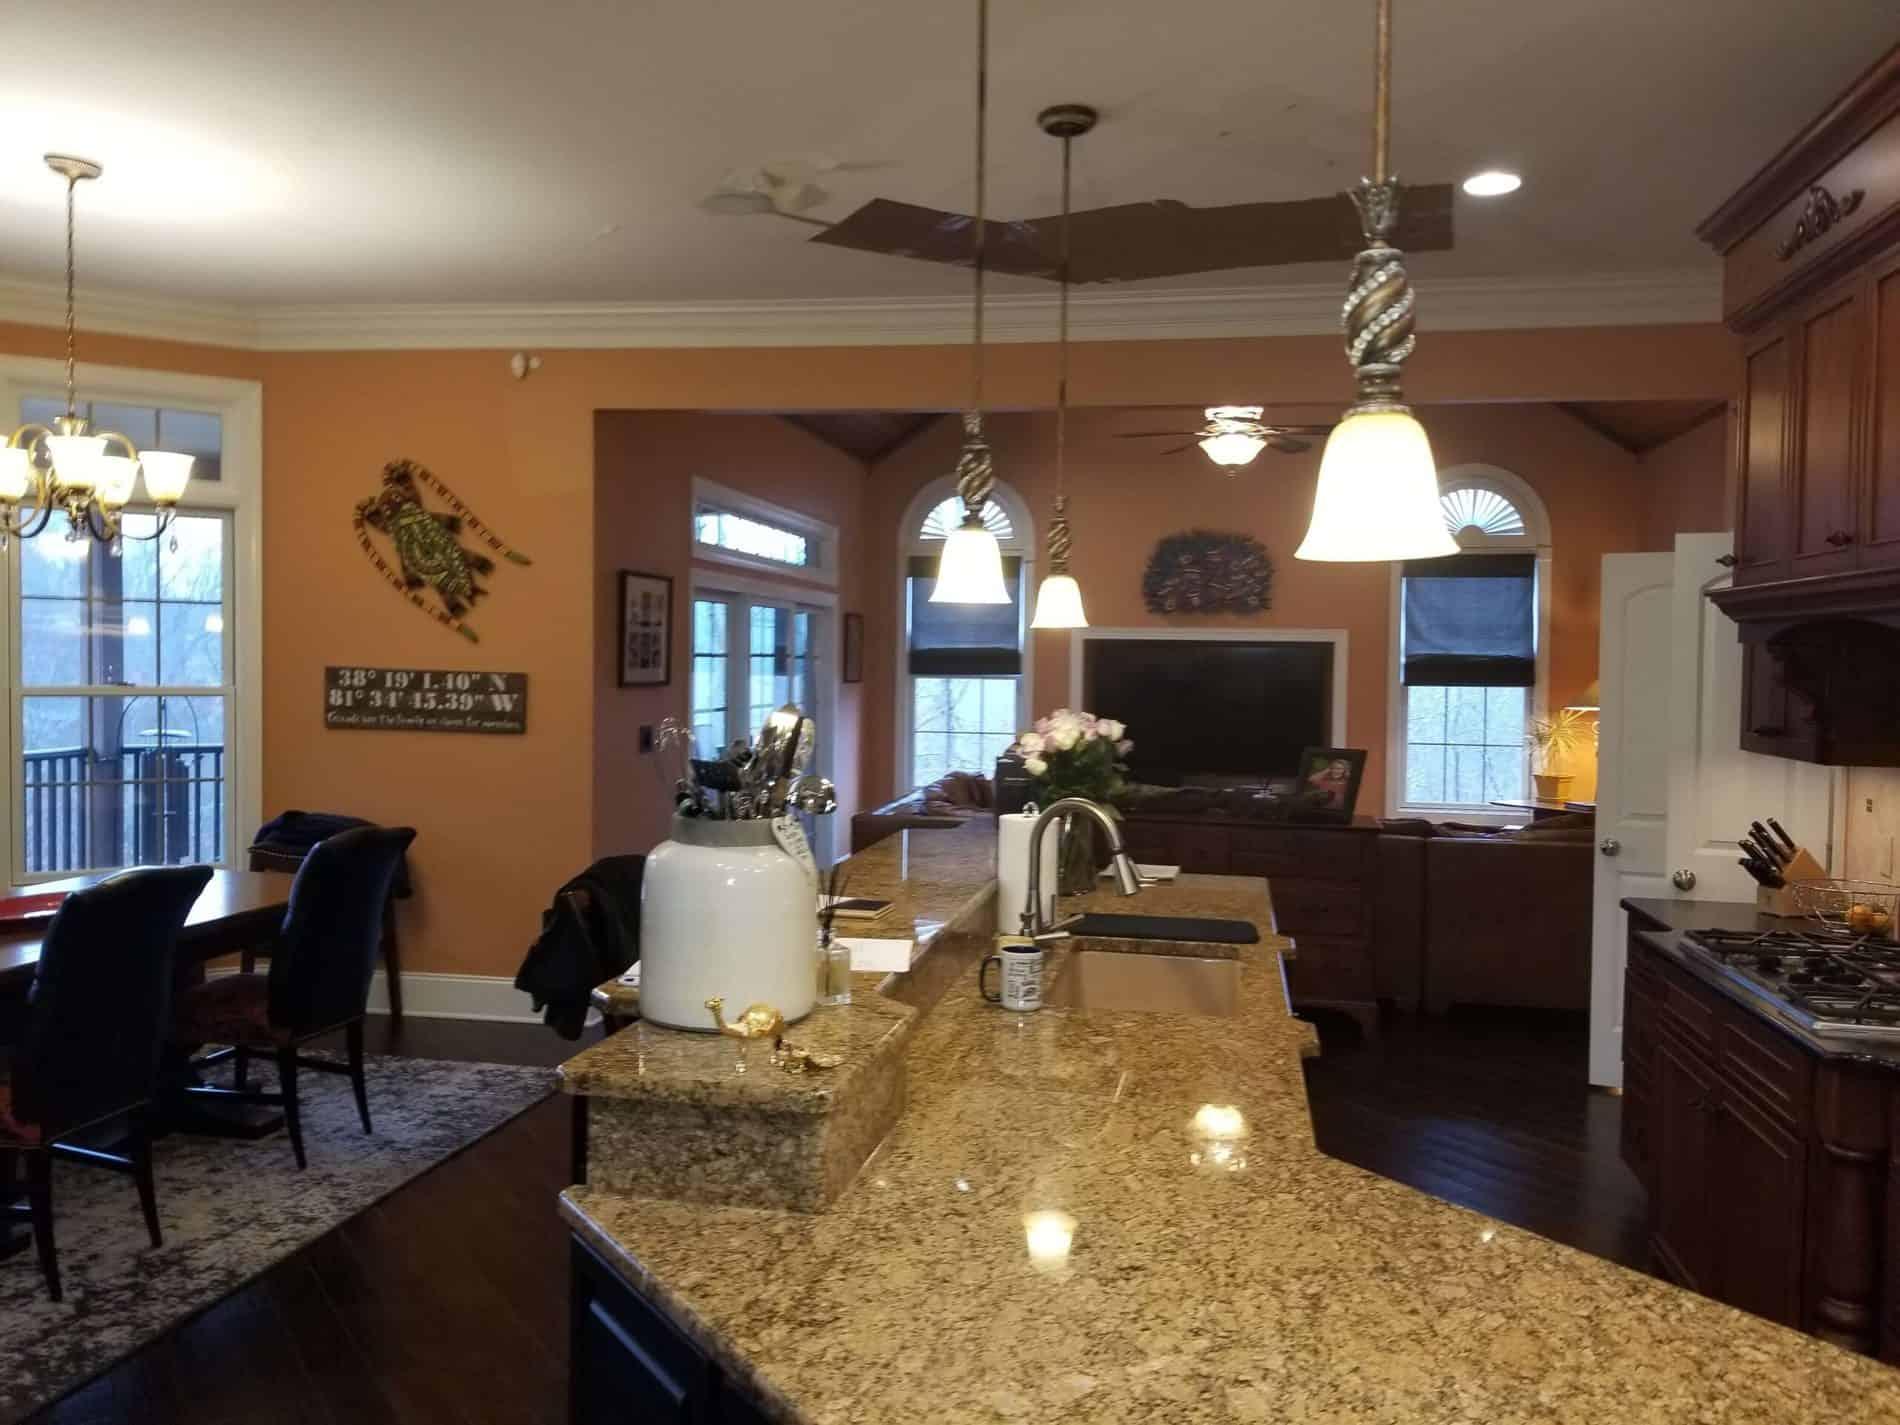 South Charleston Water Damage in Kitchen